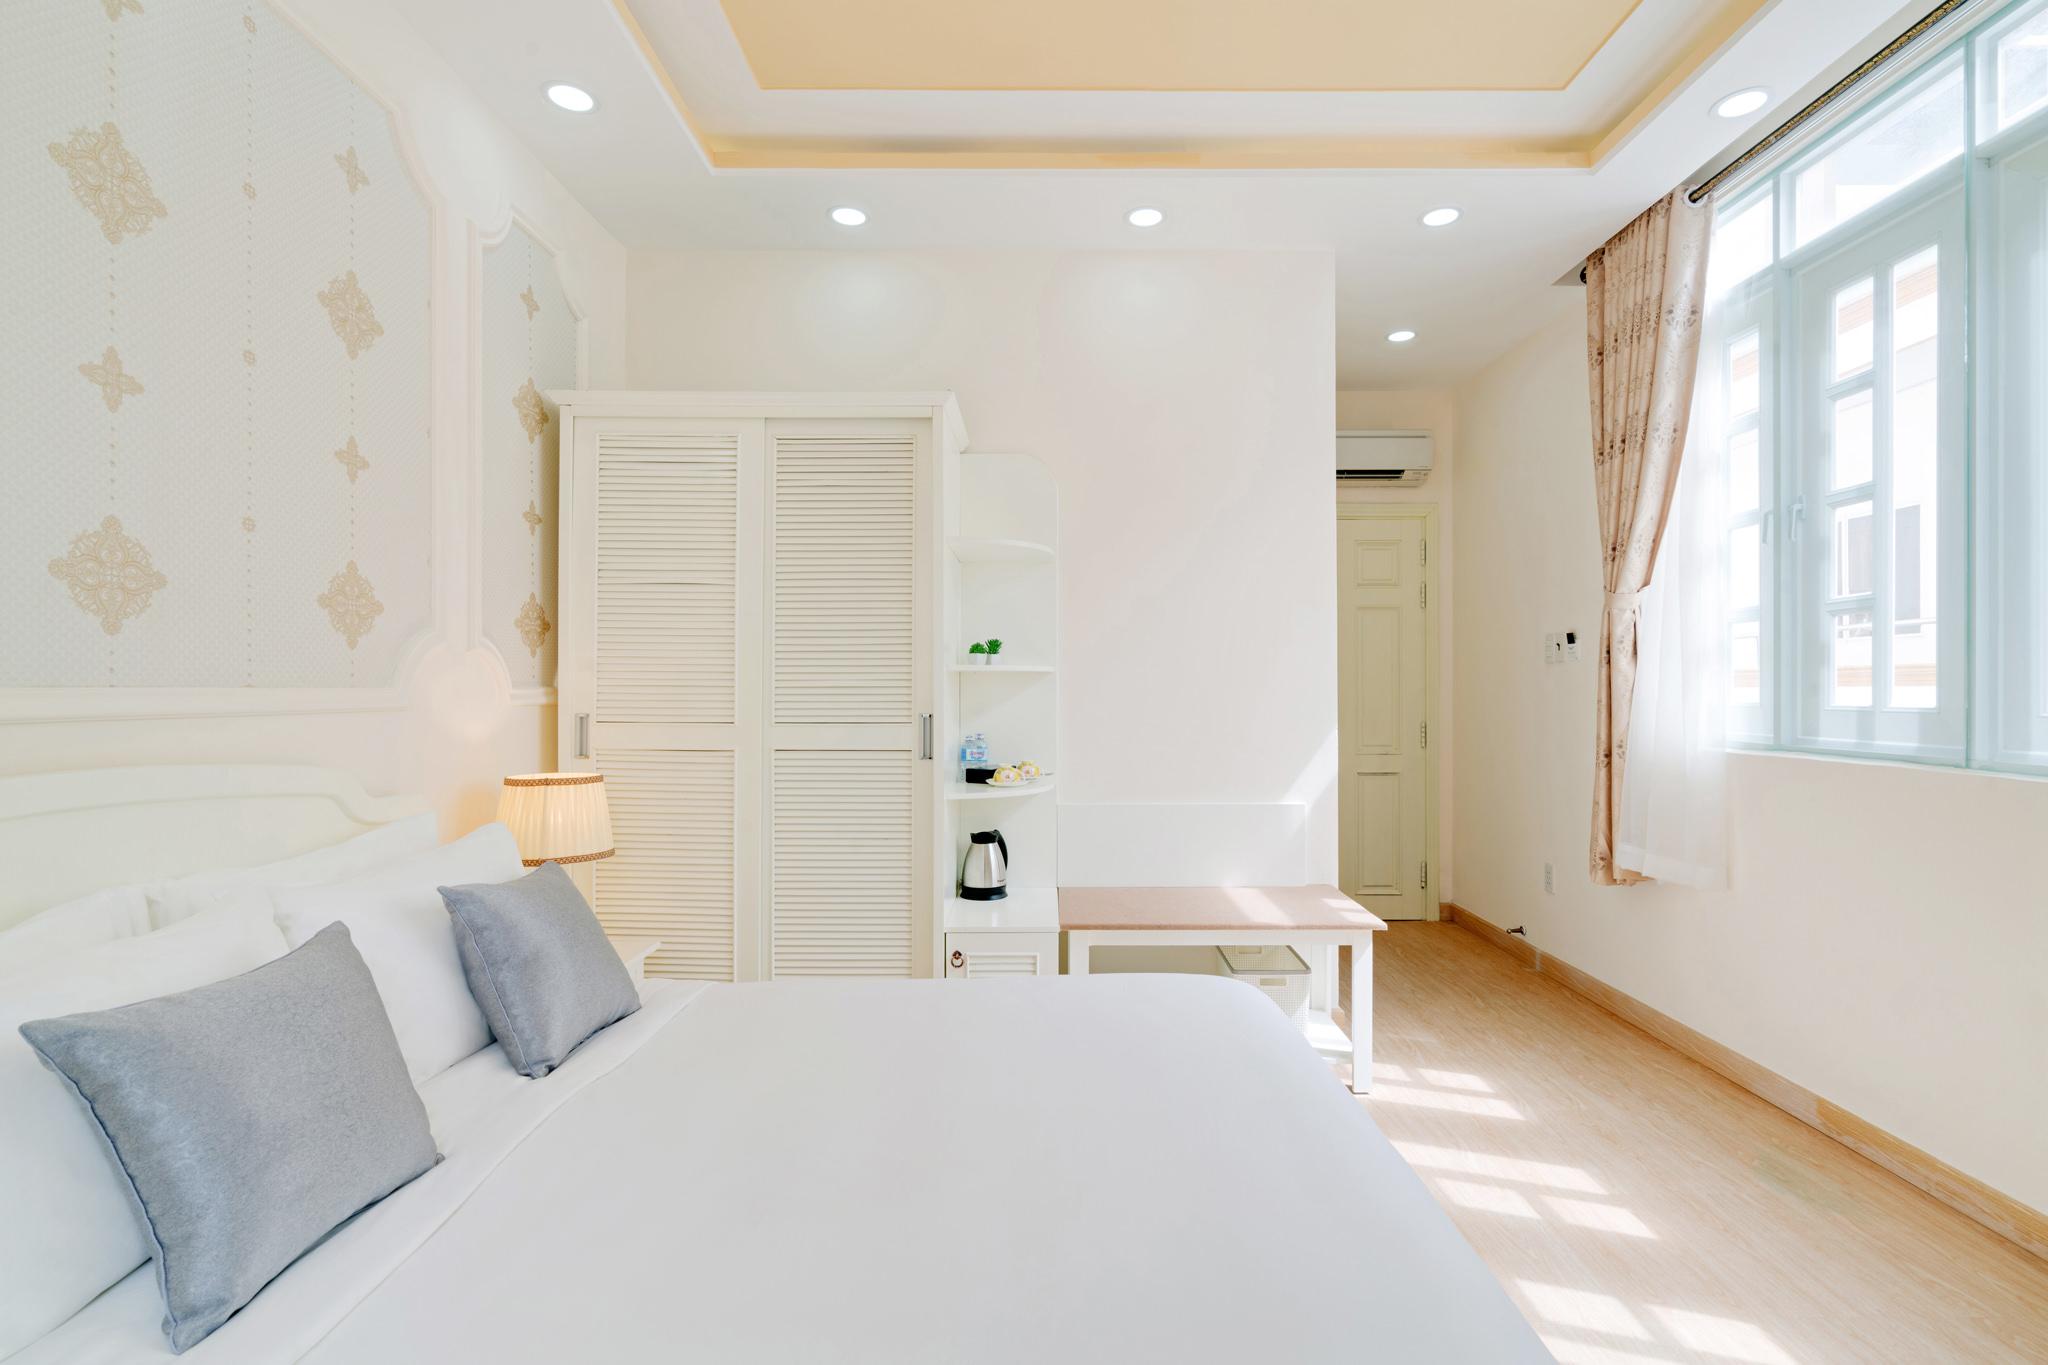 20180529 - Chez Mimosa - Interior - Hotel - 006.jpg